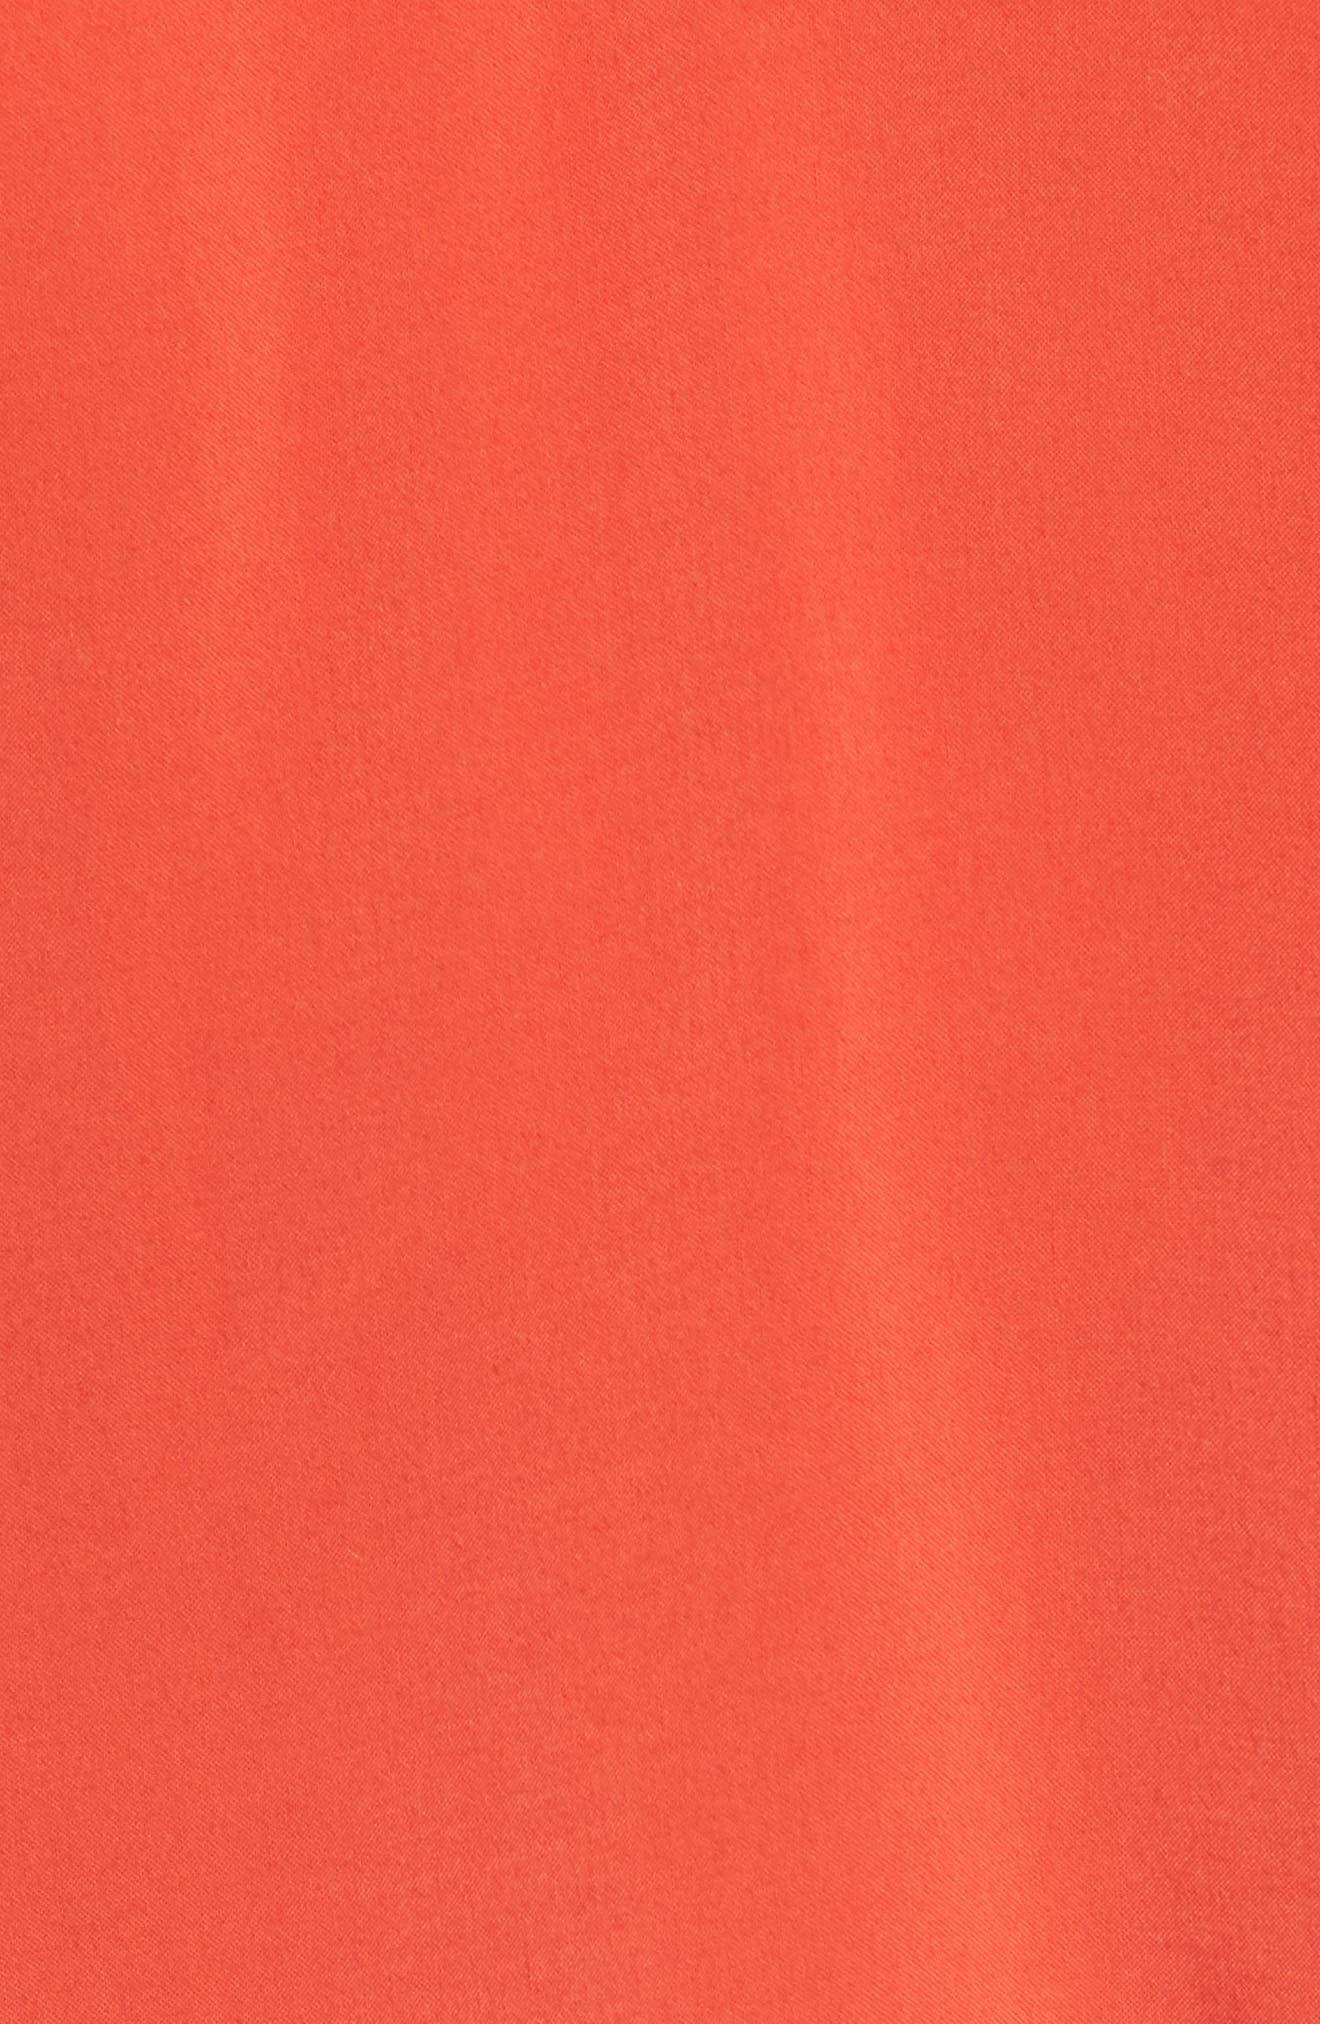 Puff Sleeve Blouse,                             Alternate thumbnail 5, color,                             RIO